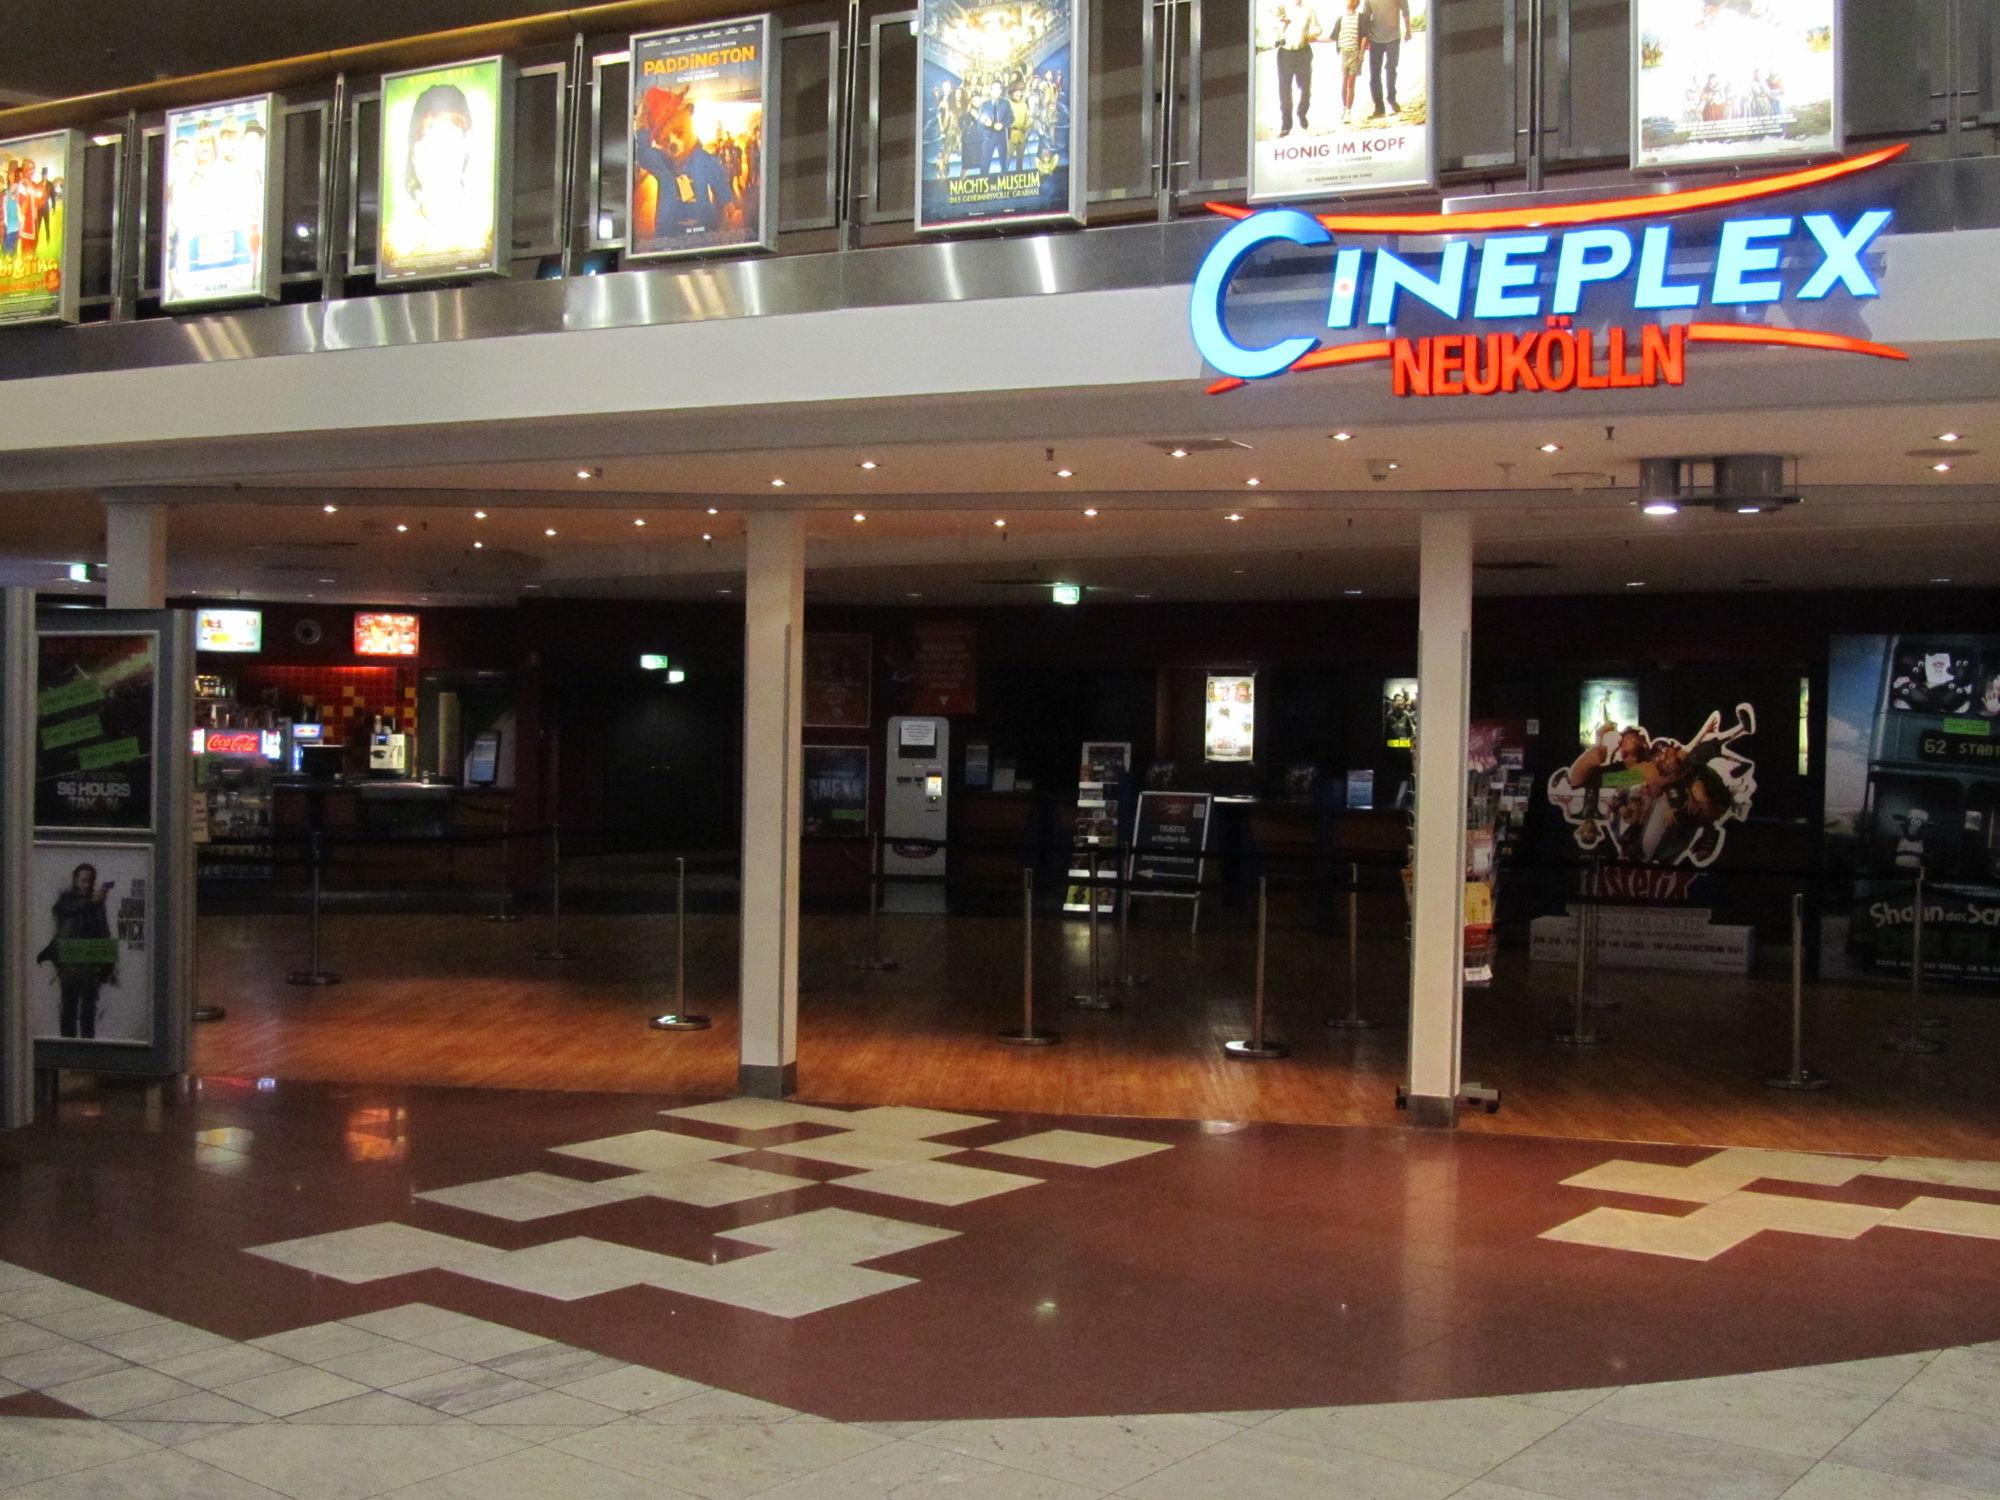 Cineplex Neukölln Arcaden Programm